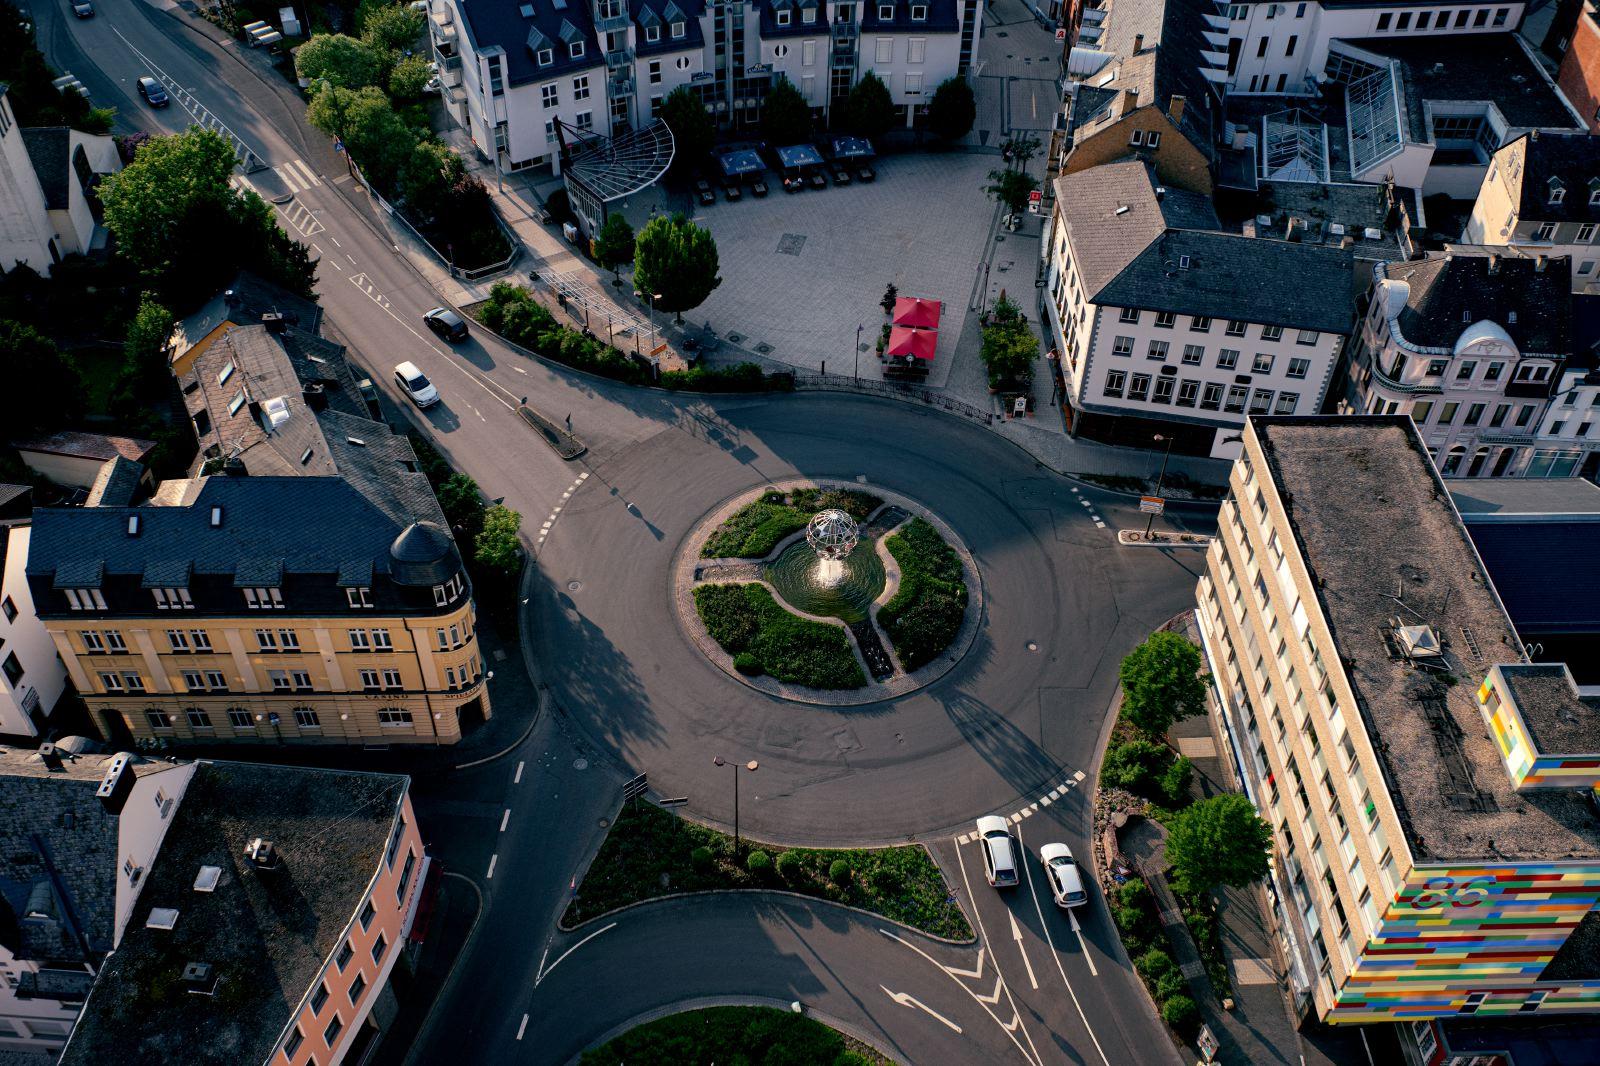 Kreisverkehr Idar - Foto © Udo Weyrauch